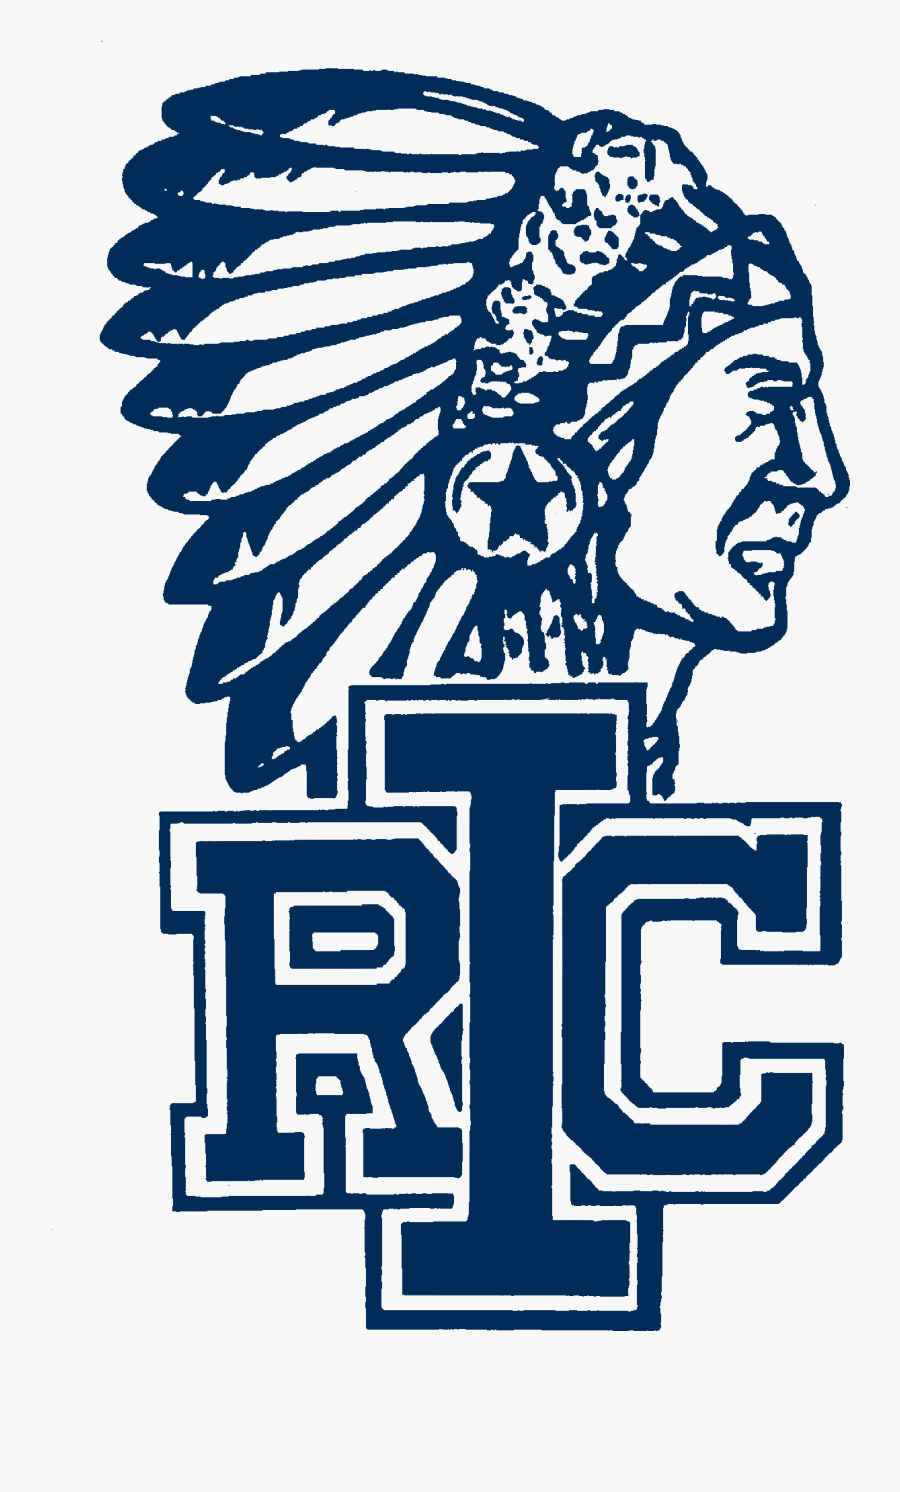 Indians Clipart Indian Creek - Indian River High School Mascot, Transparent Clipart